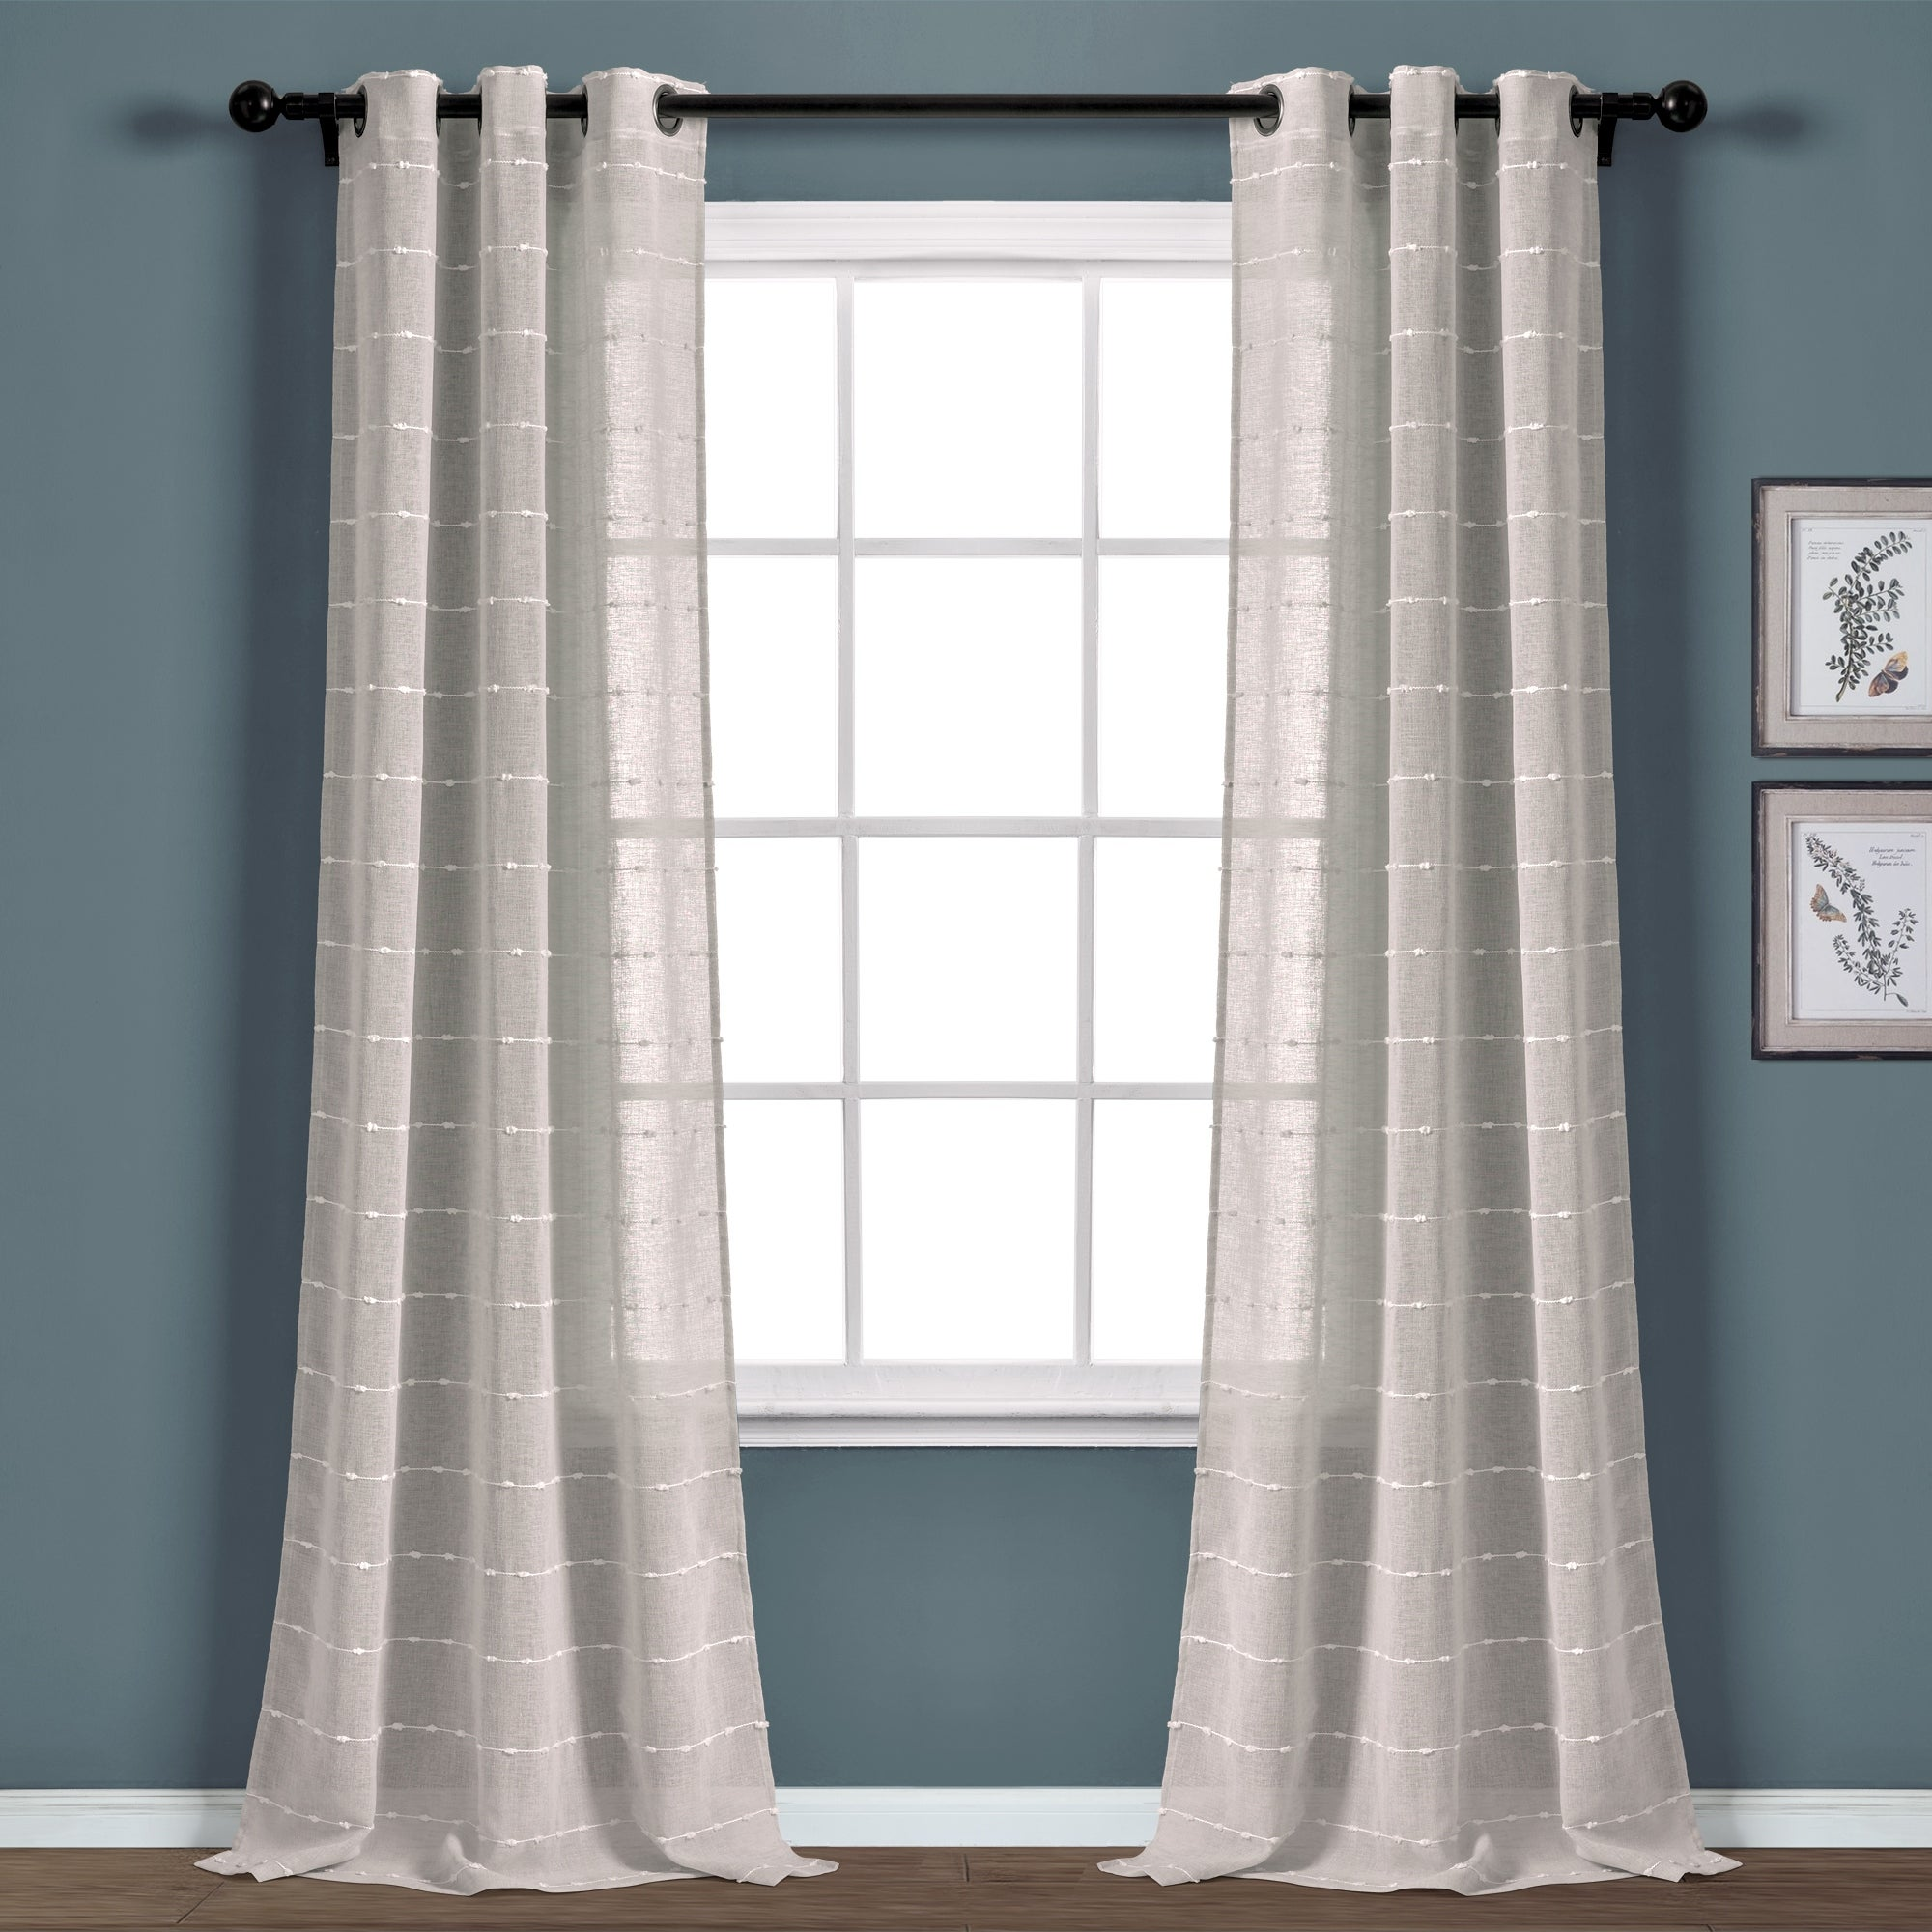 Gray Curtains Pop Against Blue Walls